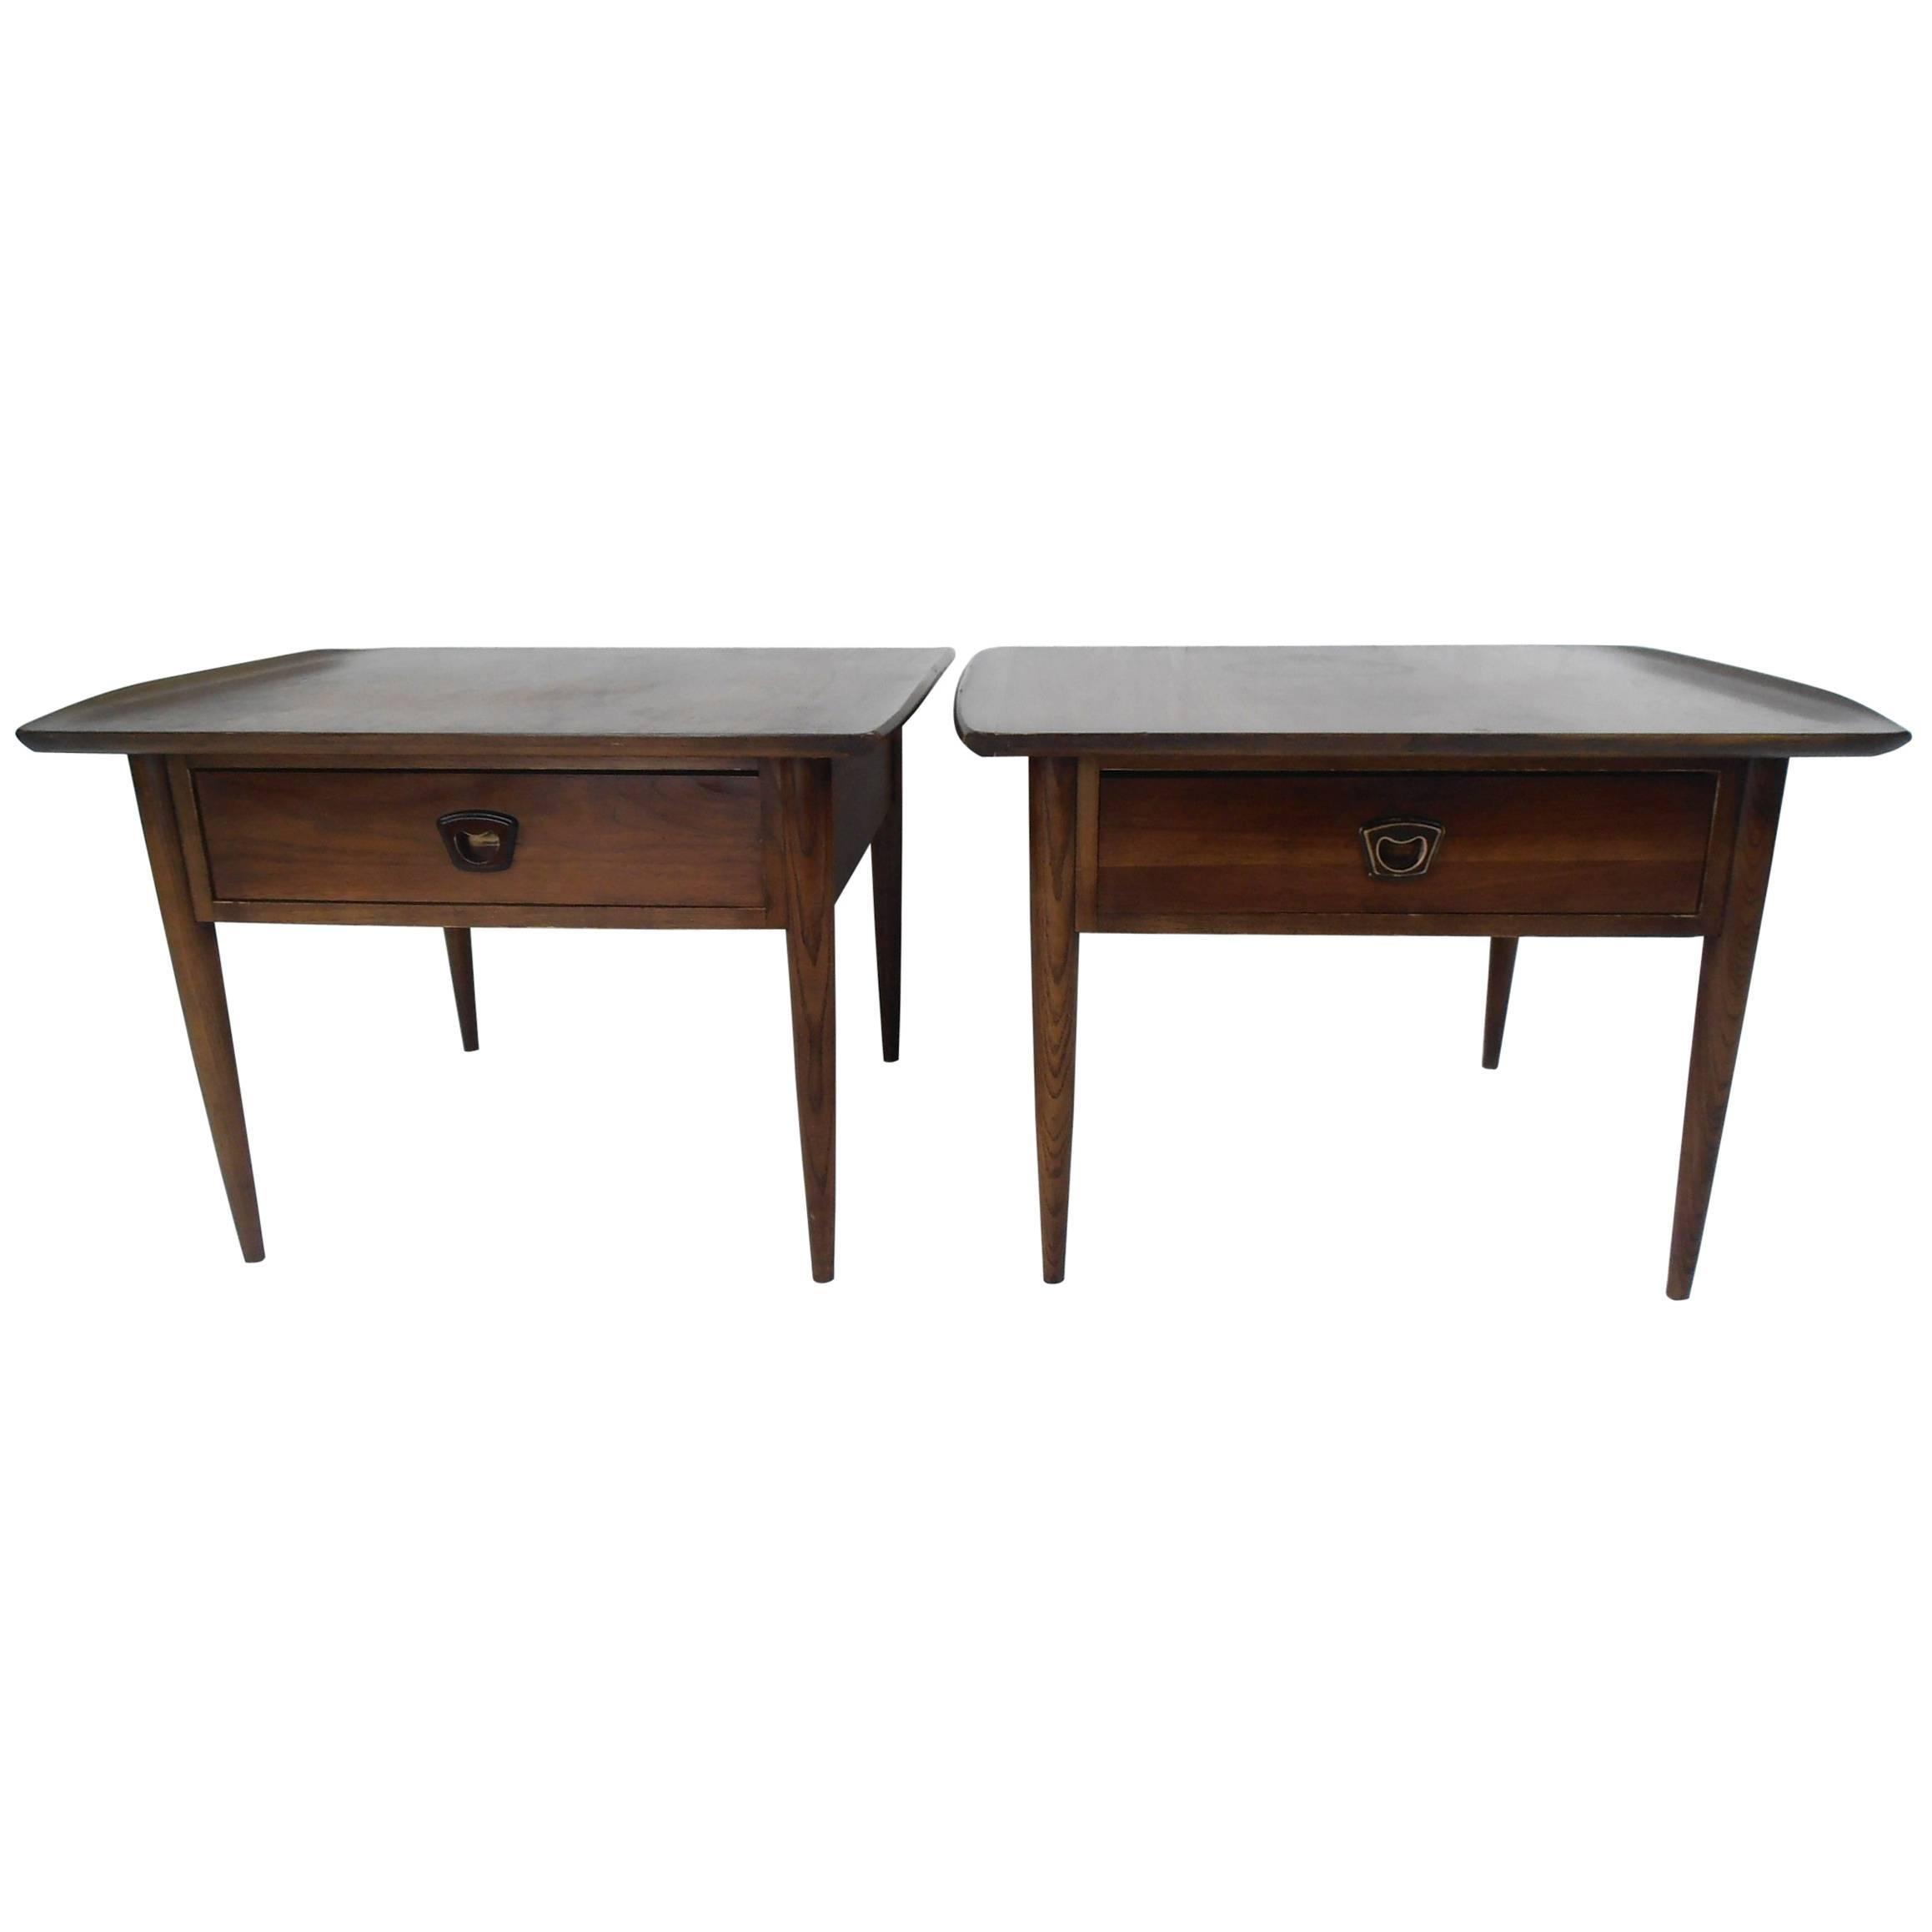 midcentury modern walnut end tables by bassett